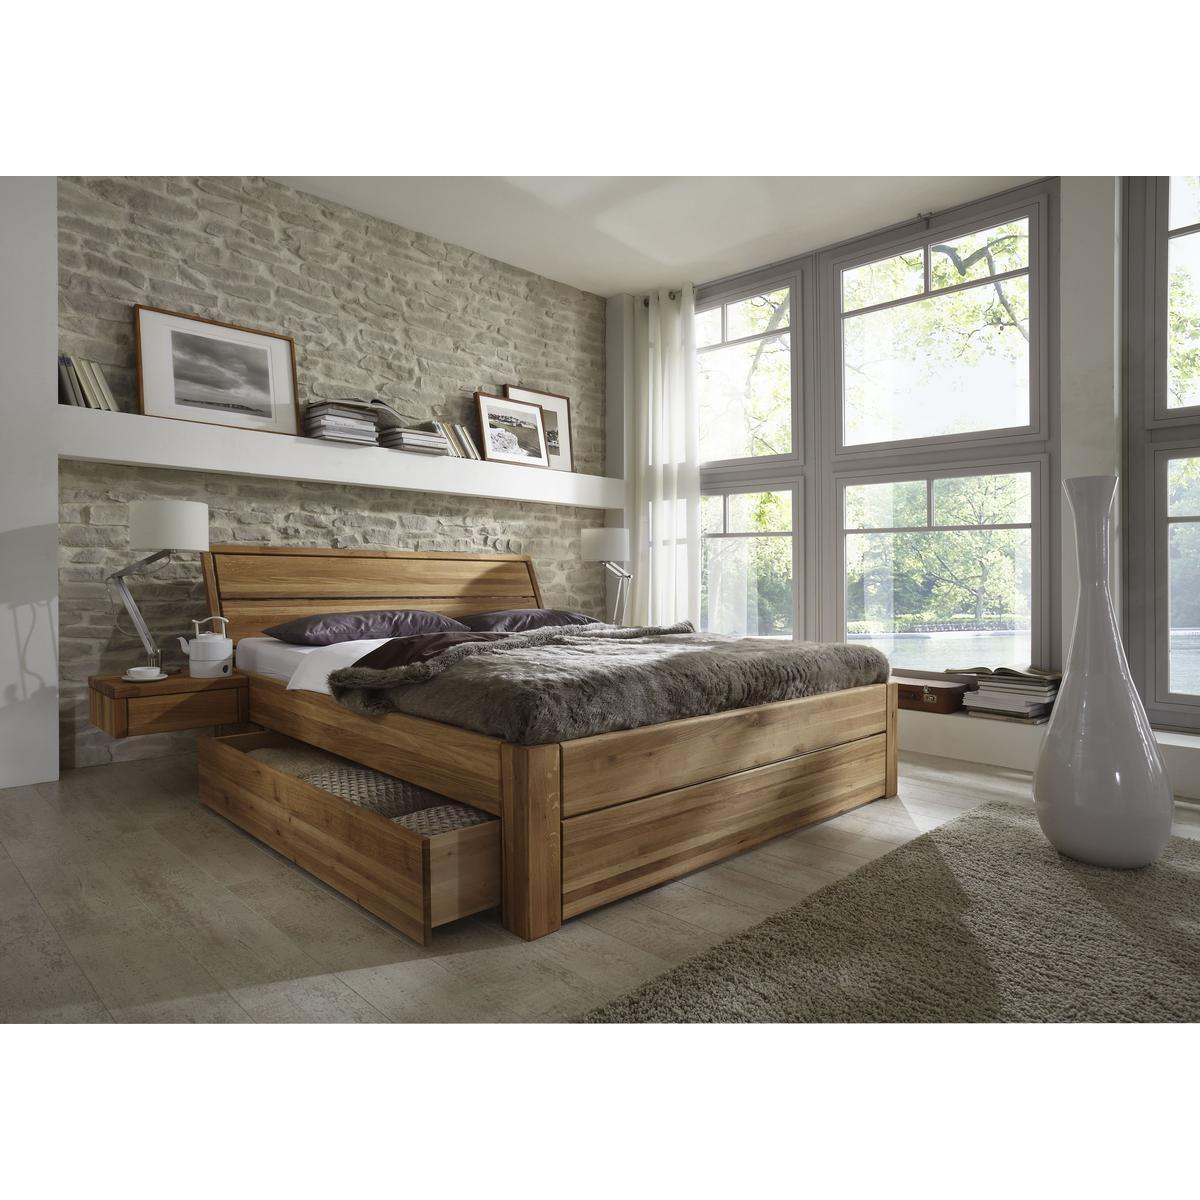 Massivholz Schubladenbett 180x200 Holzbett Bett Eiche